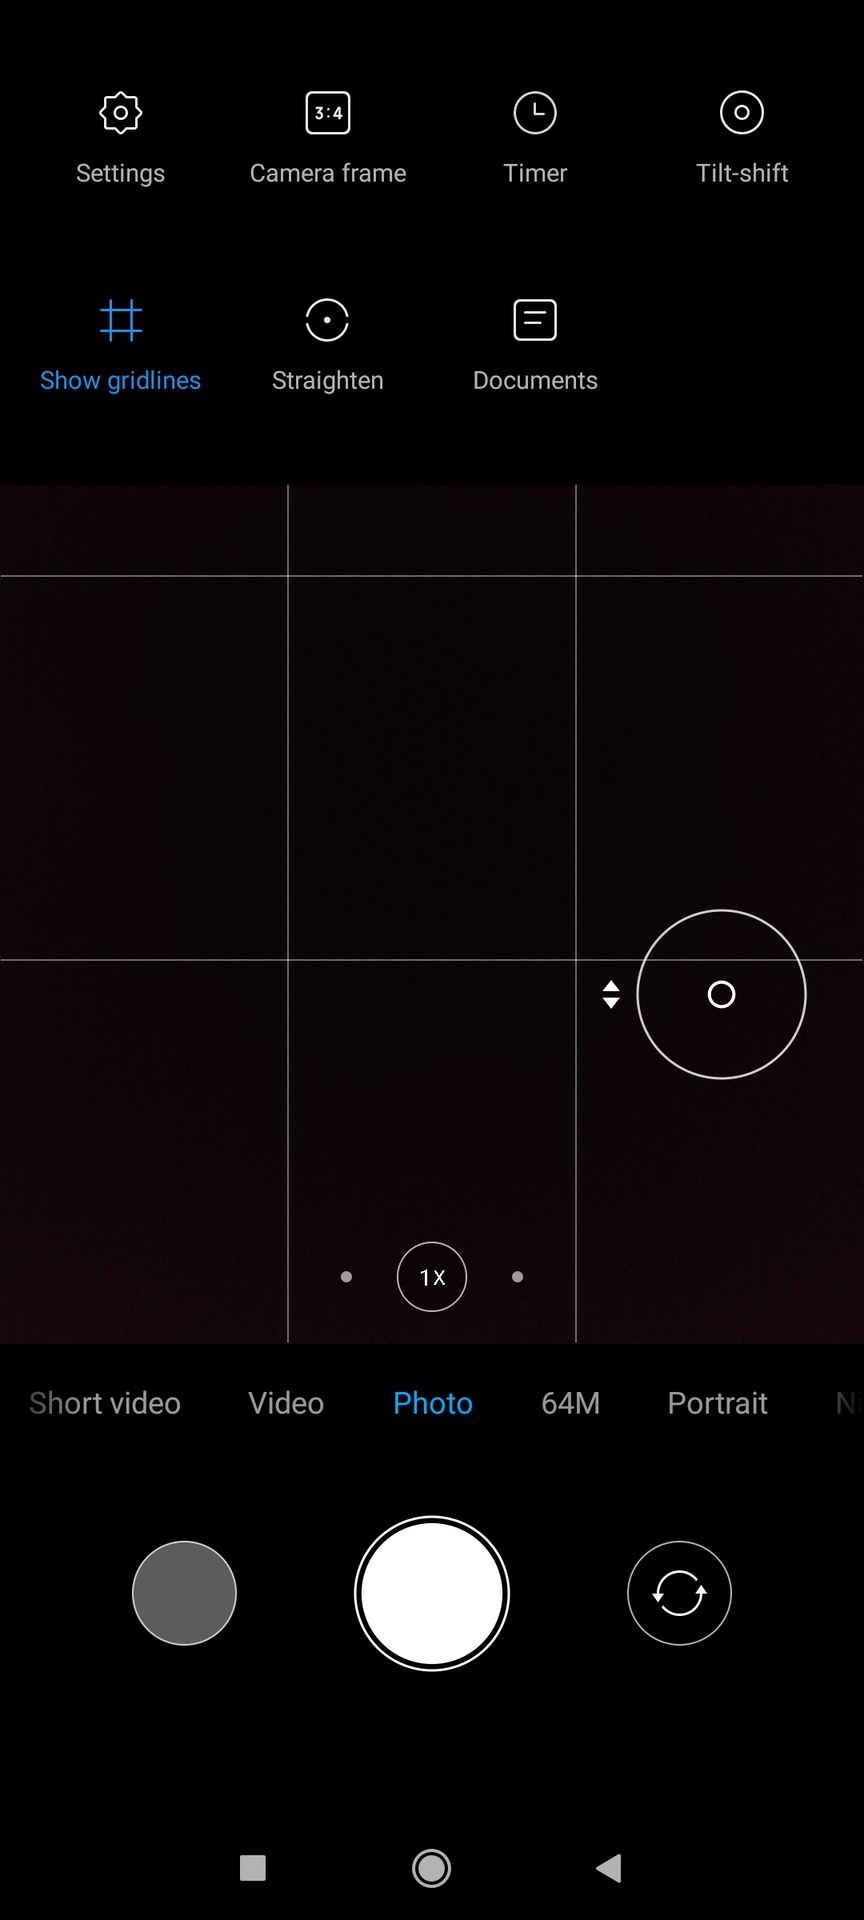 Poco F2 Pro camera app Photo mode with options